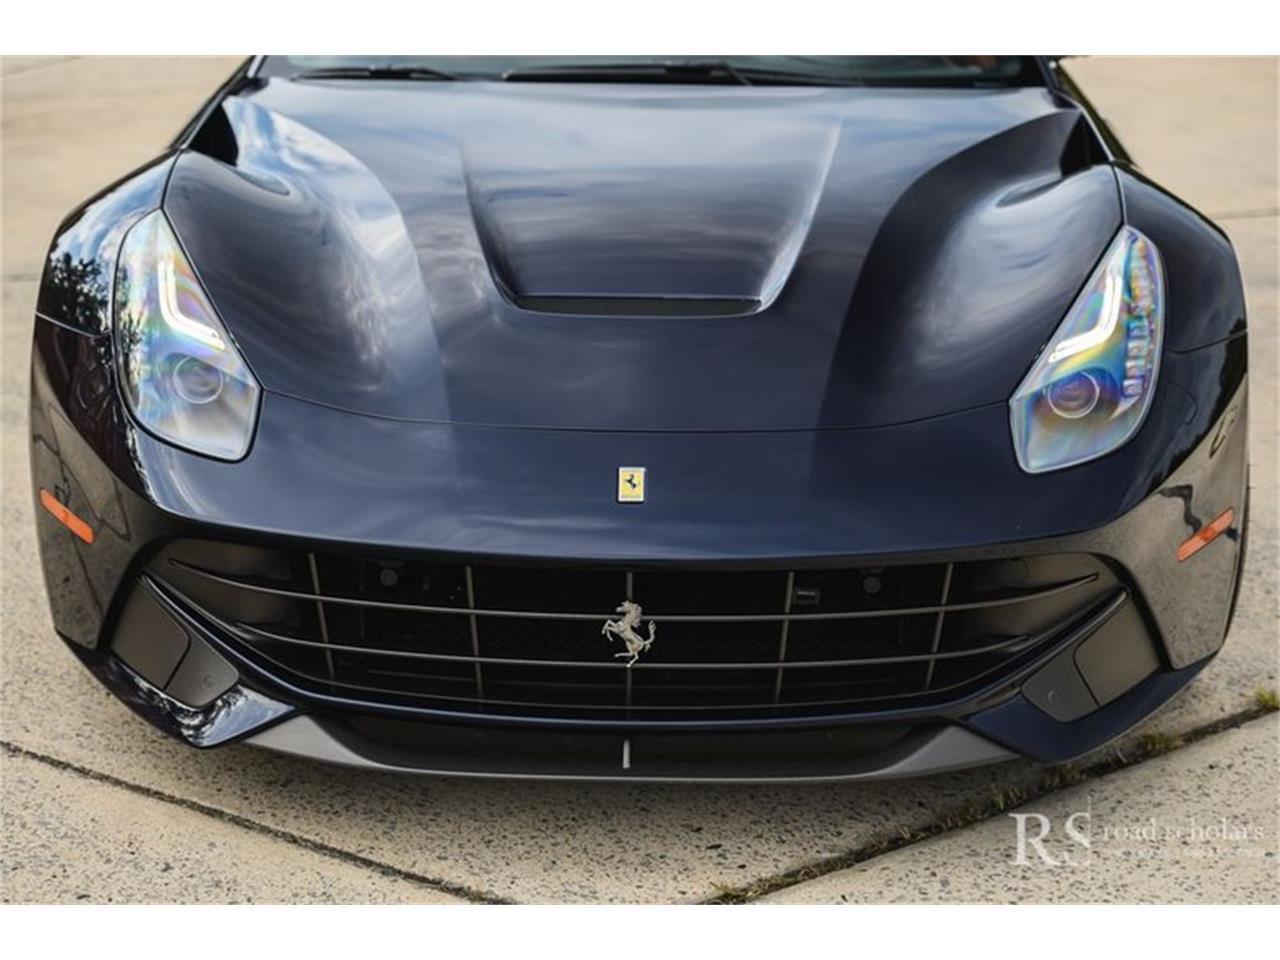 2015 Ferrari F12berlinetta (CC-1251267) for sale in Raleigh, North Carolina